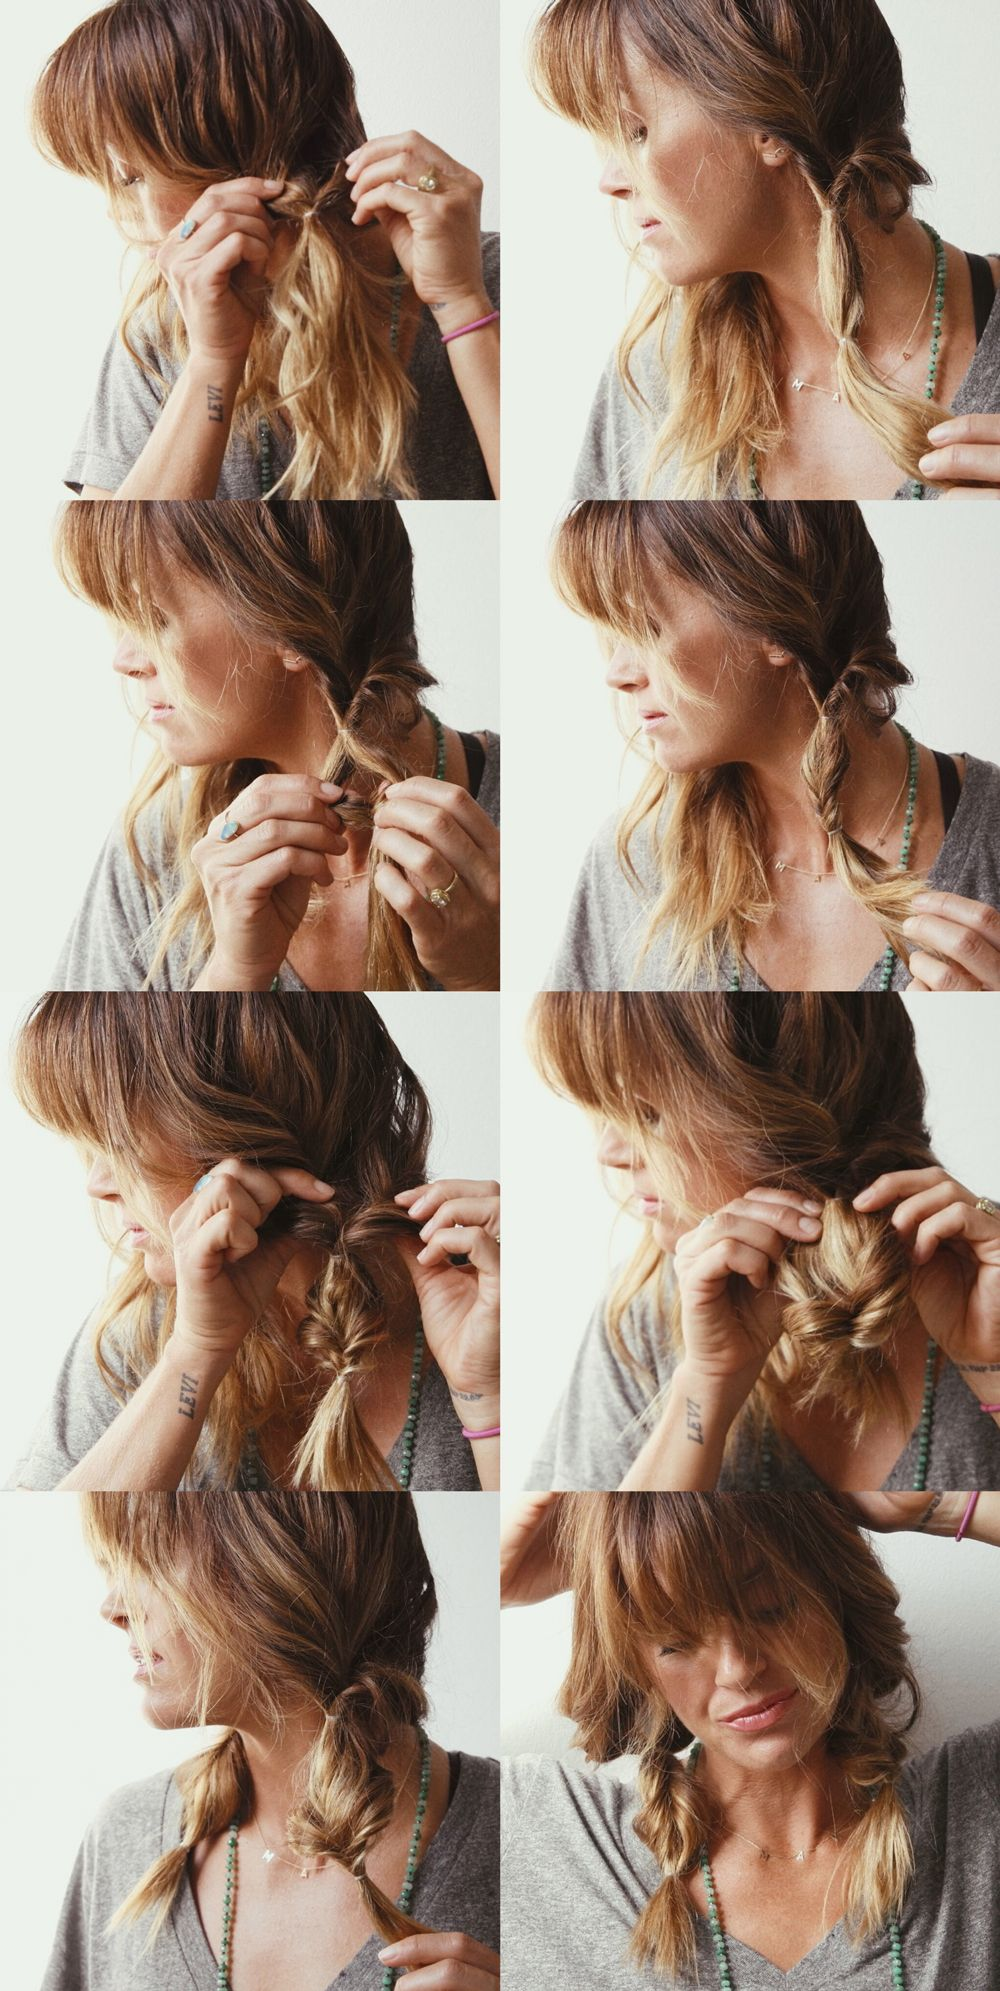 Loopy Braids Medium Length Hair Styles Hairstyles For Medium Length Hair Easy Braids For Medium Length Hair